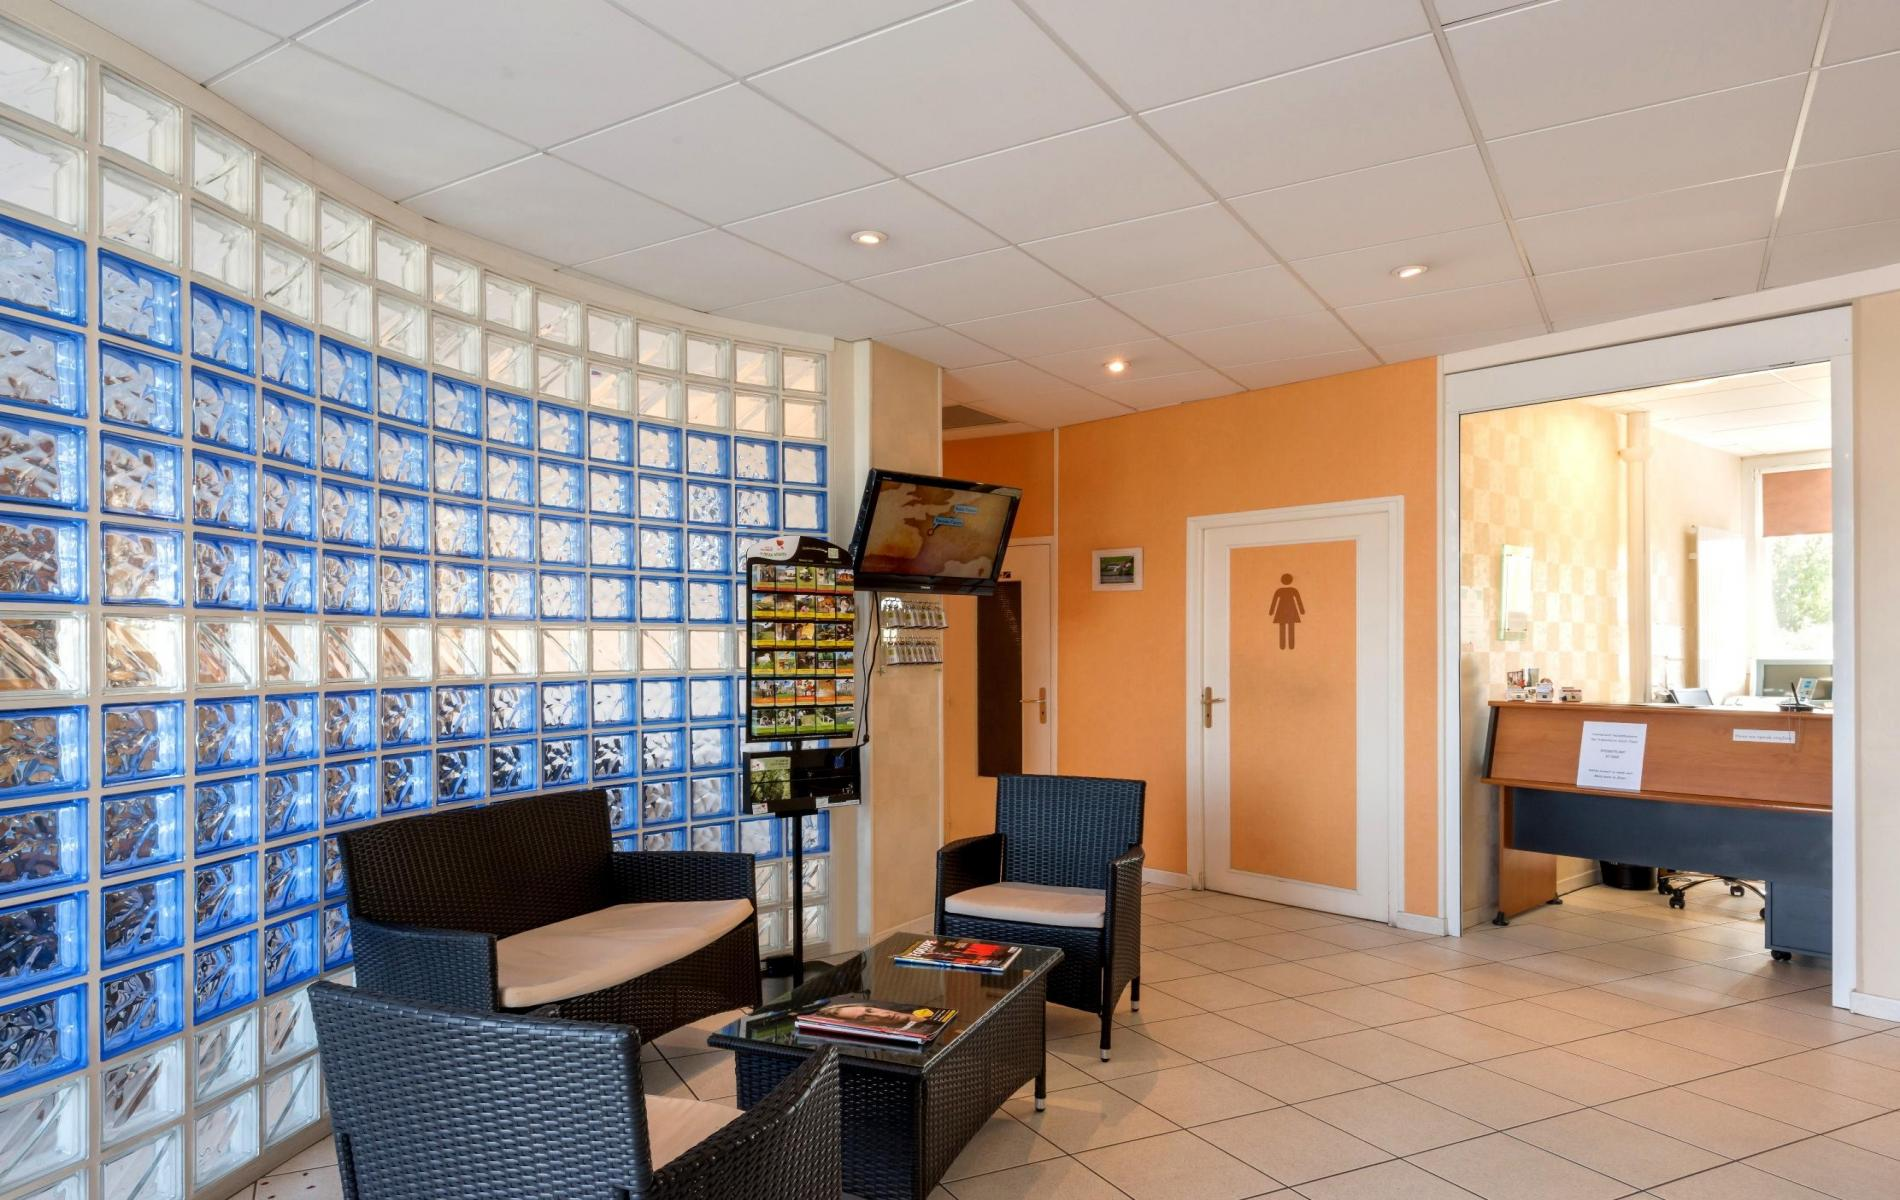 Hotel à 3 km de la gare de Thouars